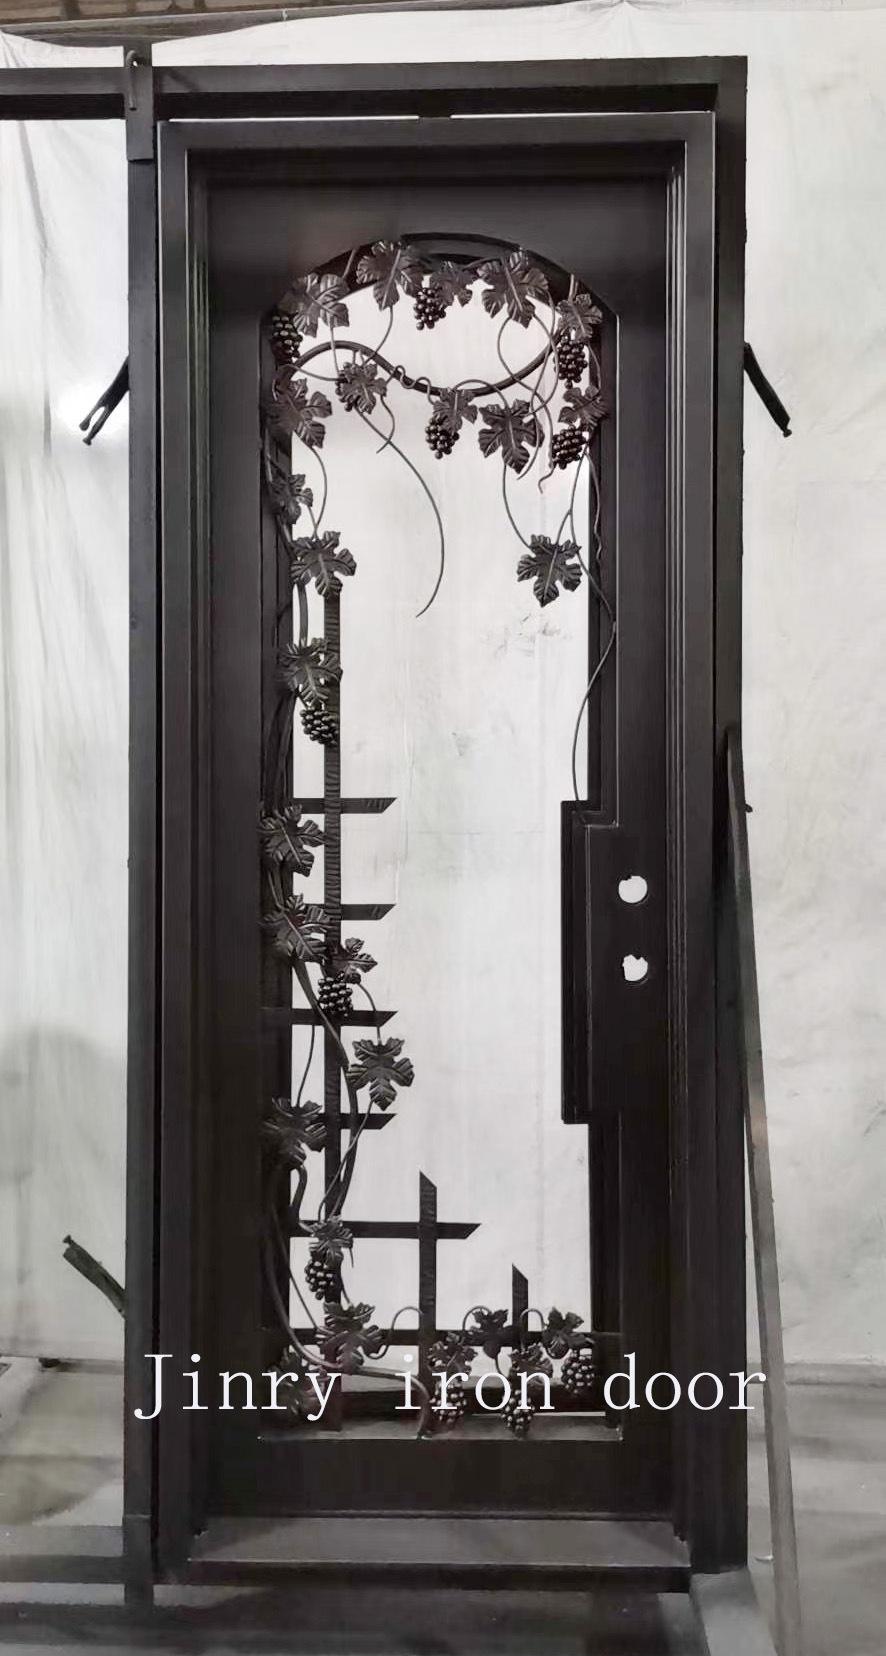 China Wine Cellar Door Forging Leafs Grape Designs Door For Basement China Wine Cellar Door Forging Leaf